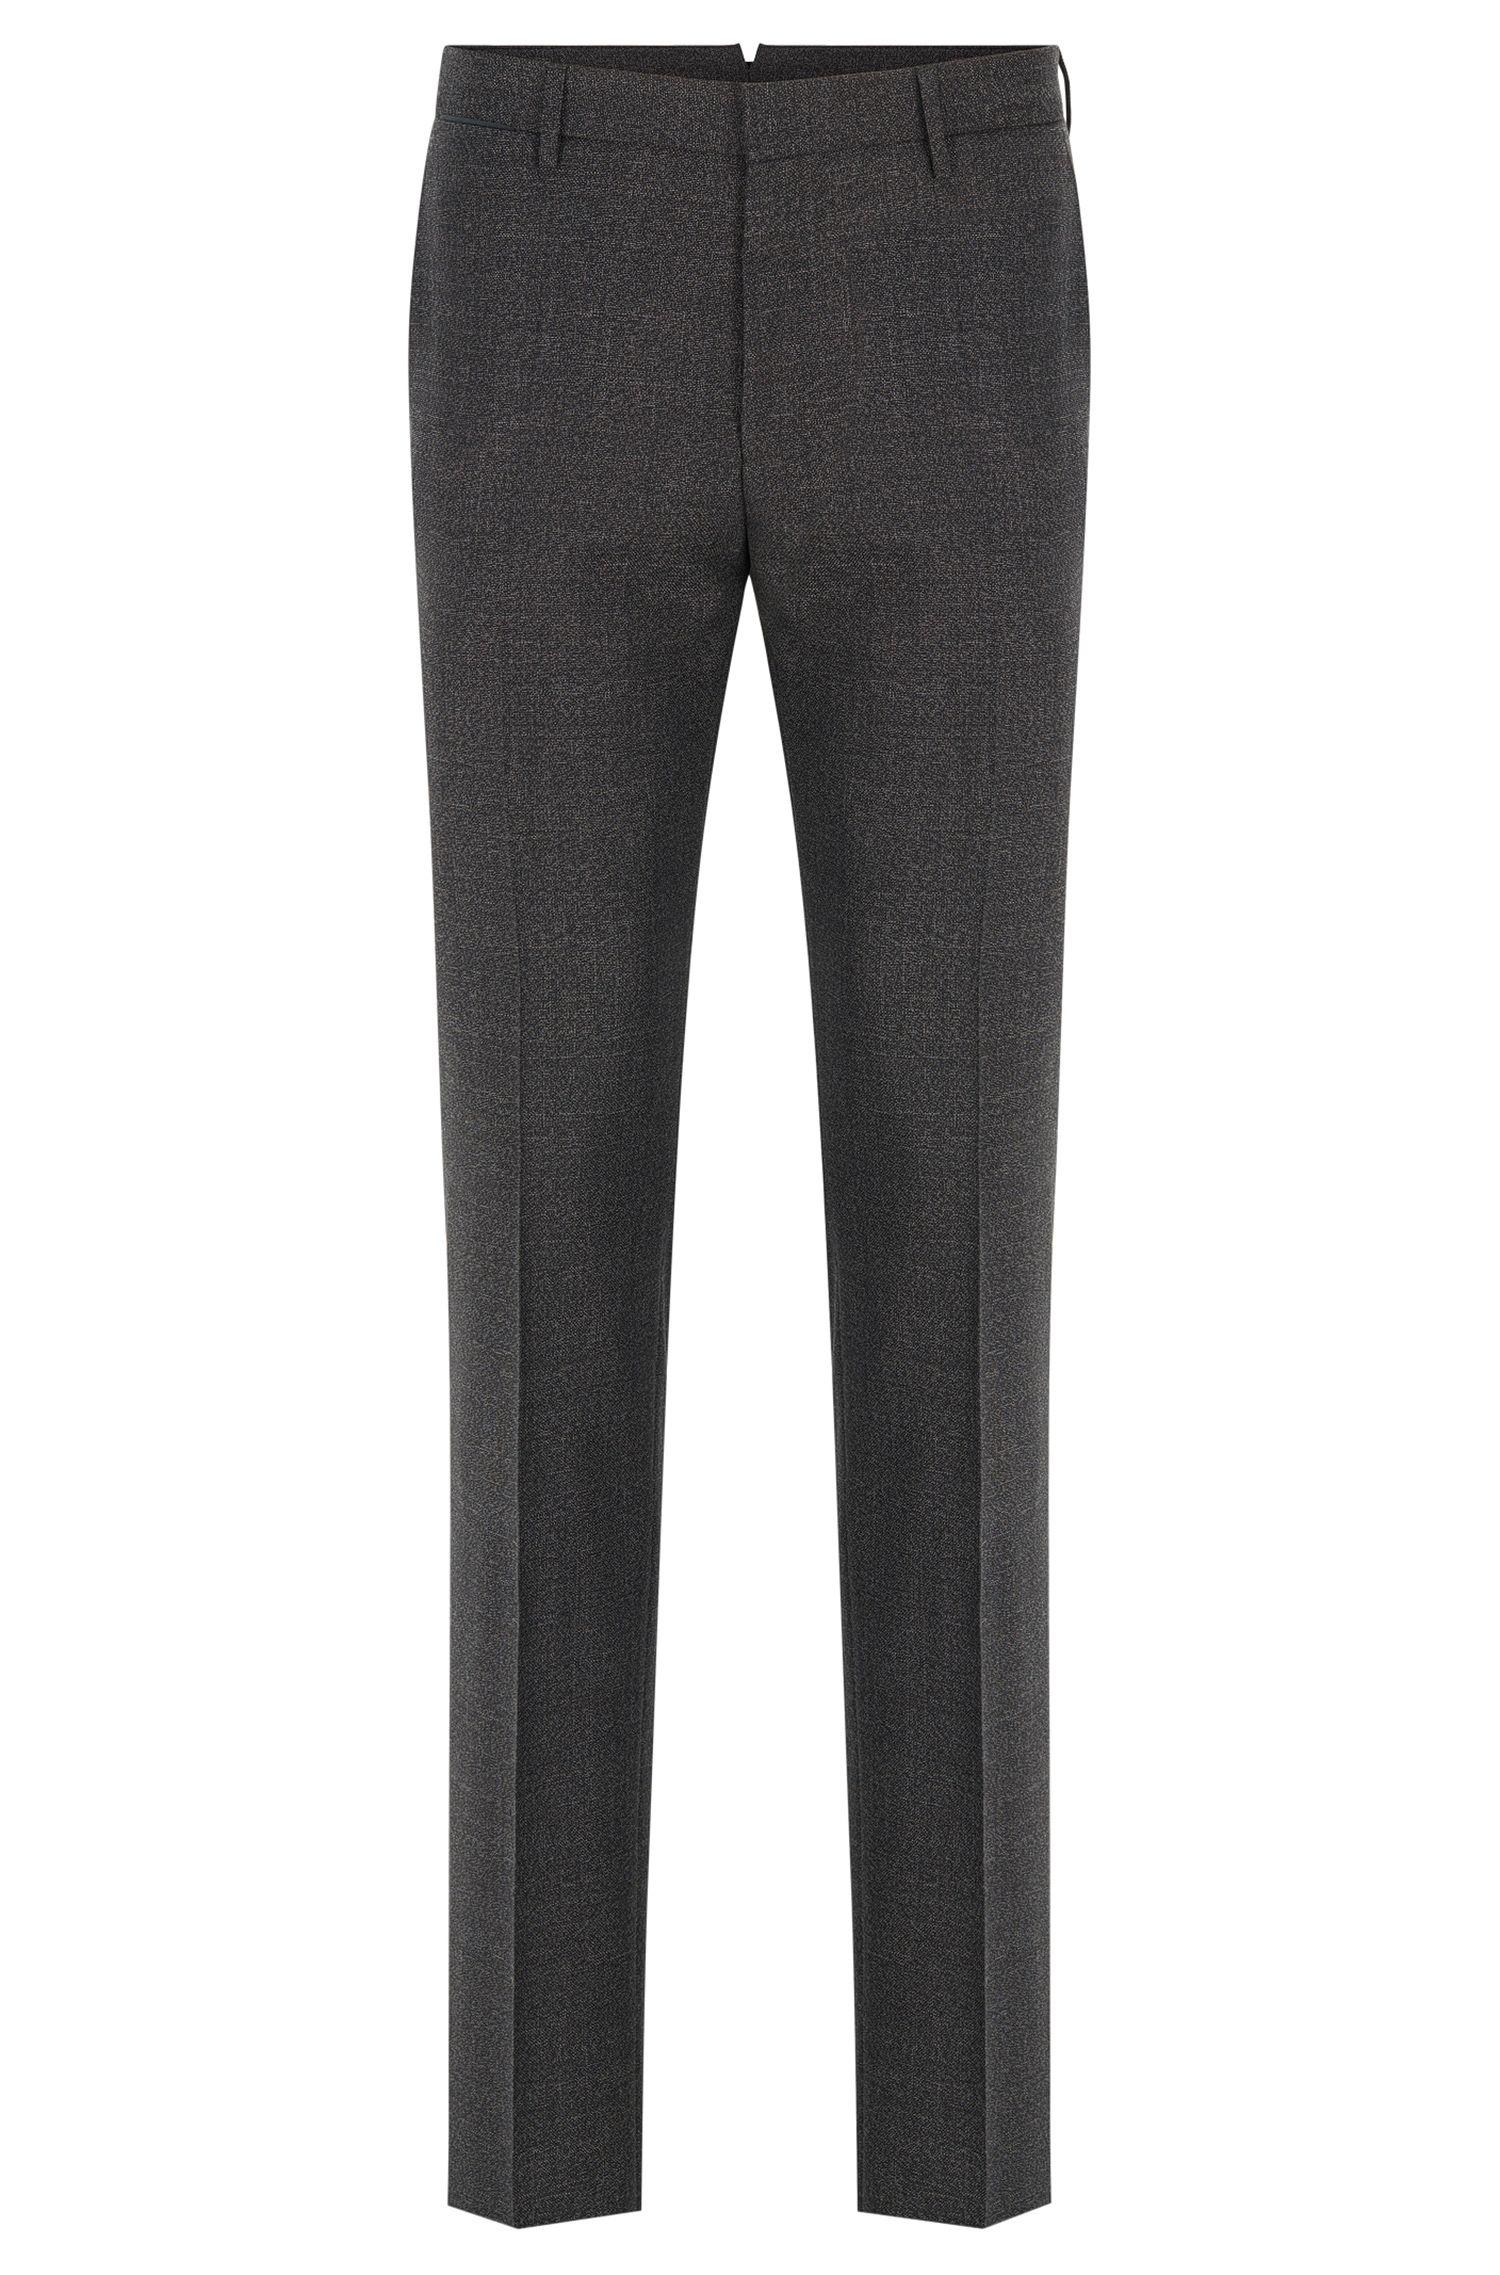 Pantaloni slim fit in lana vergine elasticizzata mouliné